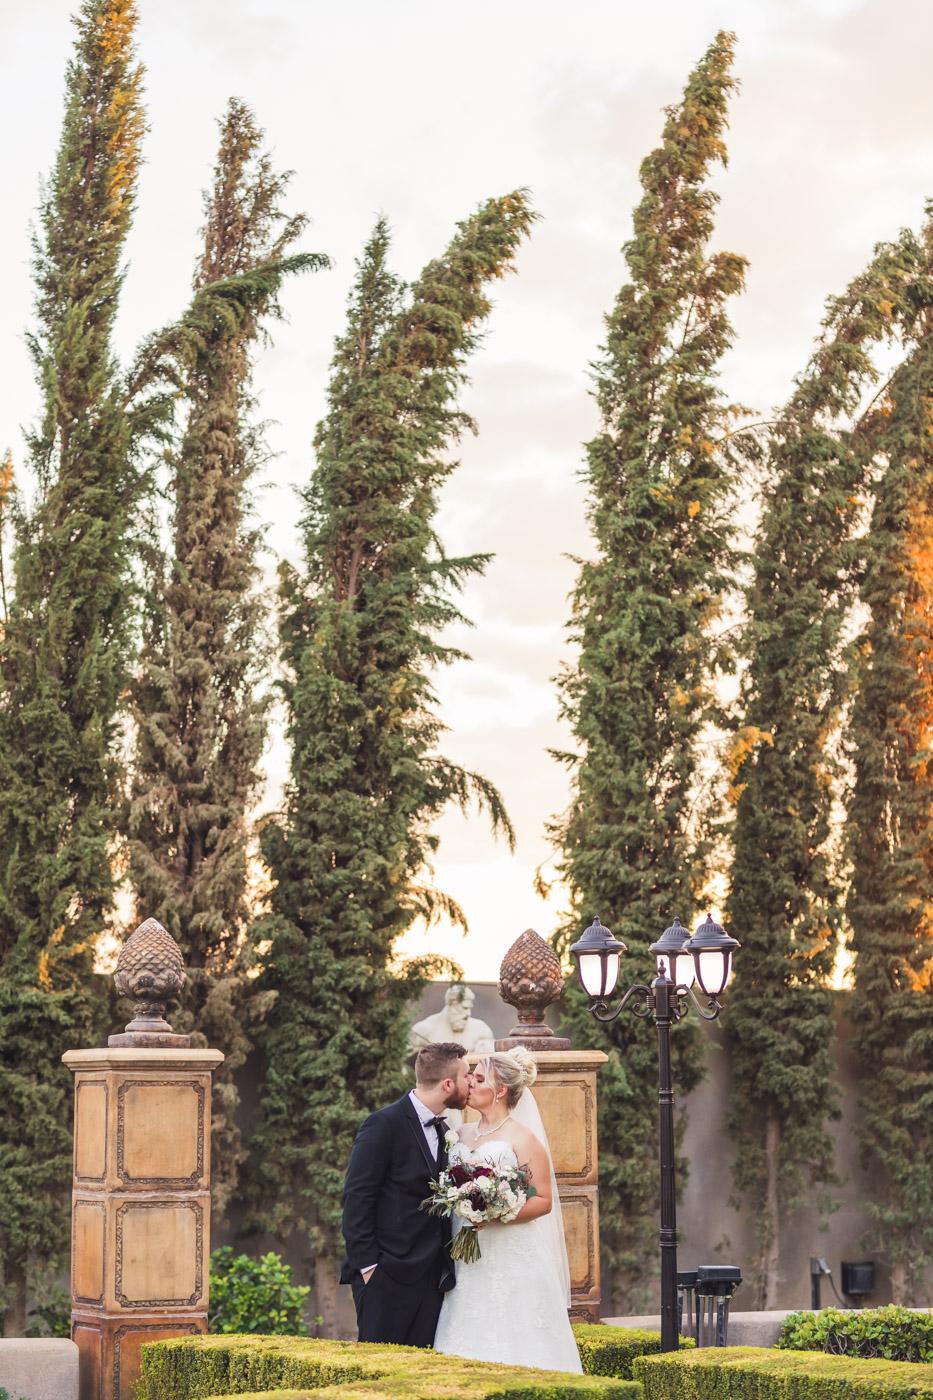 aaron-kes-photography-ashley-castle-wedding-21.jpg